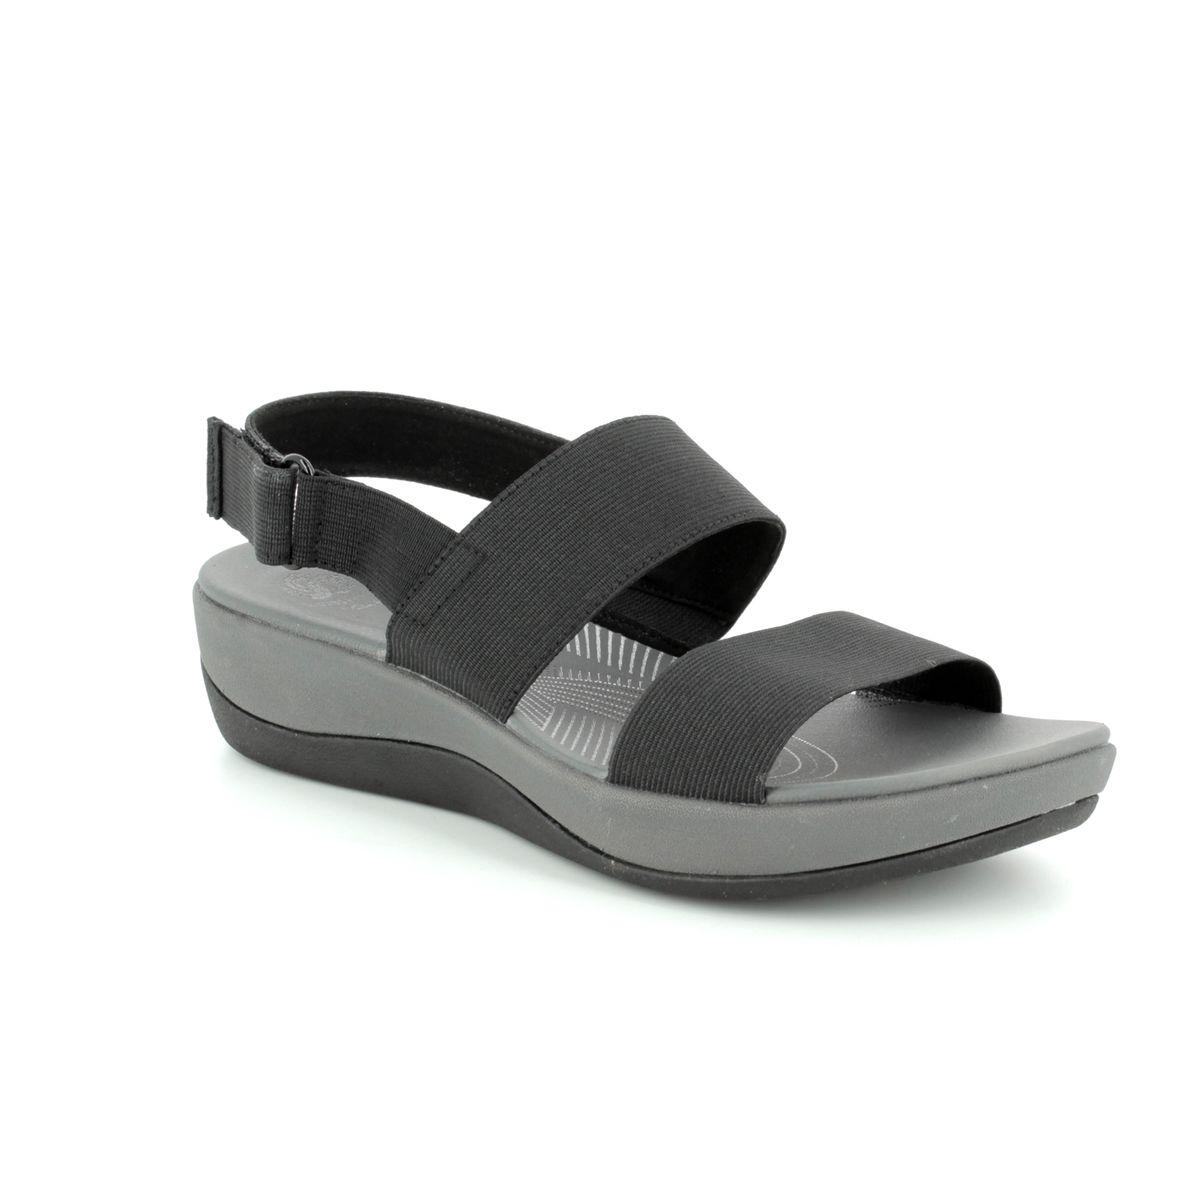 256034d Arla Jacory at Begg Shoes & Bags